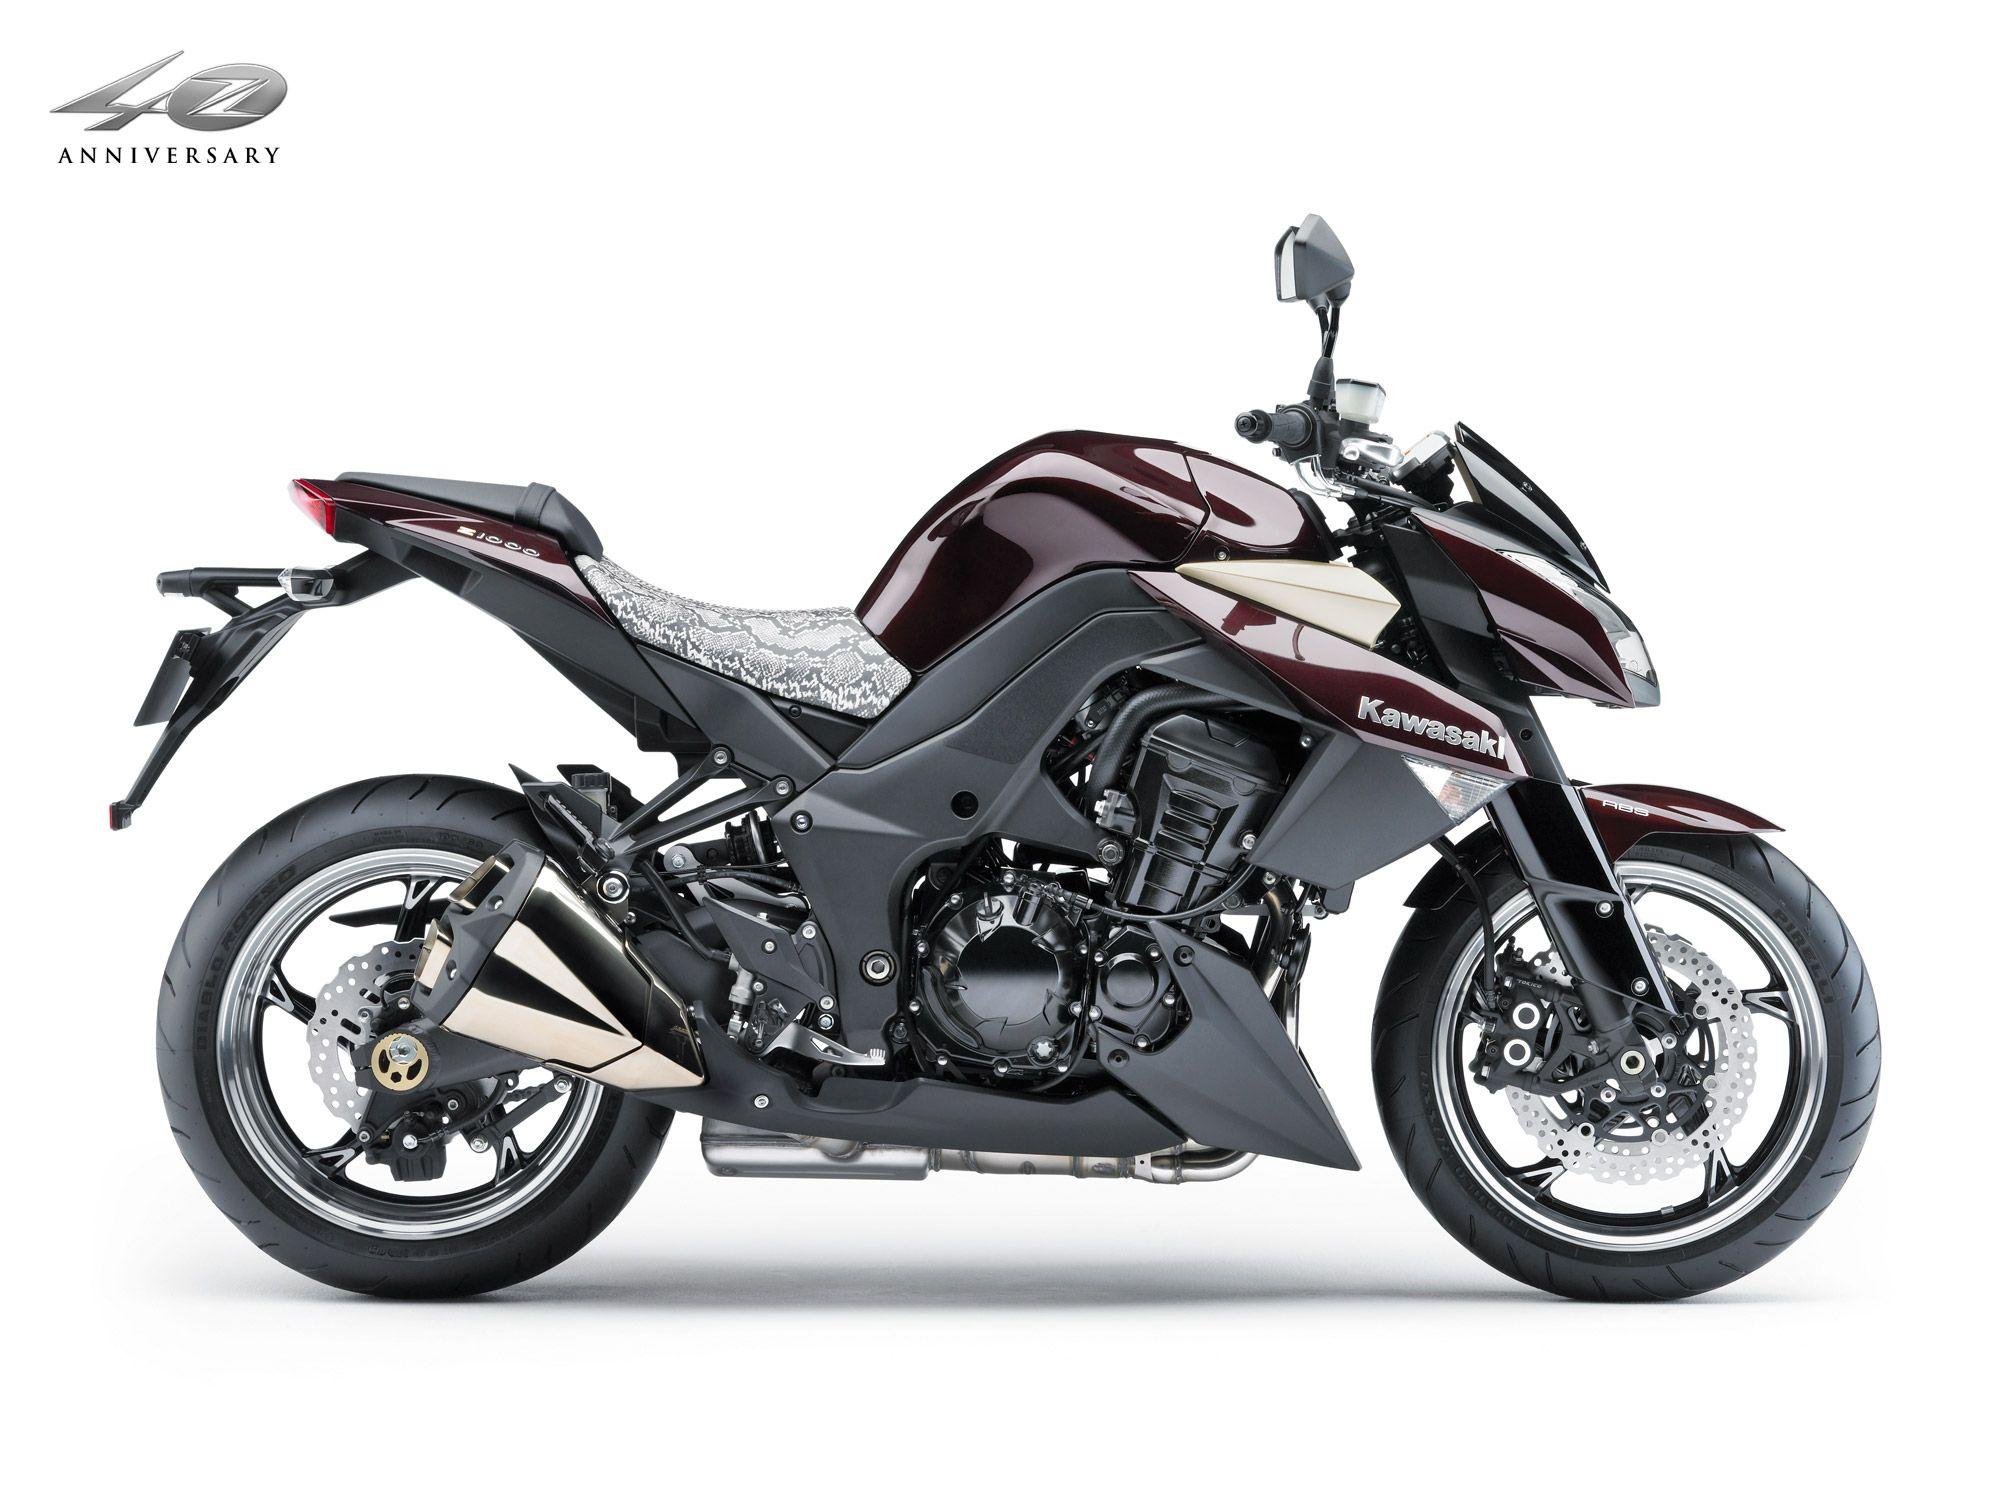 KAWASAKI Z1000 2010 Motos, Motocicletas y Fichas